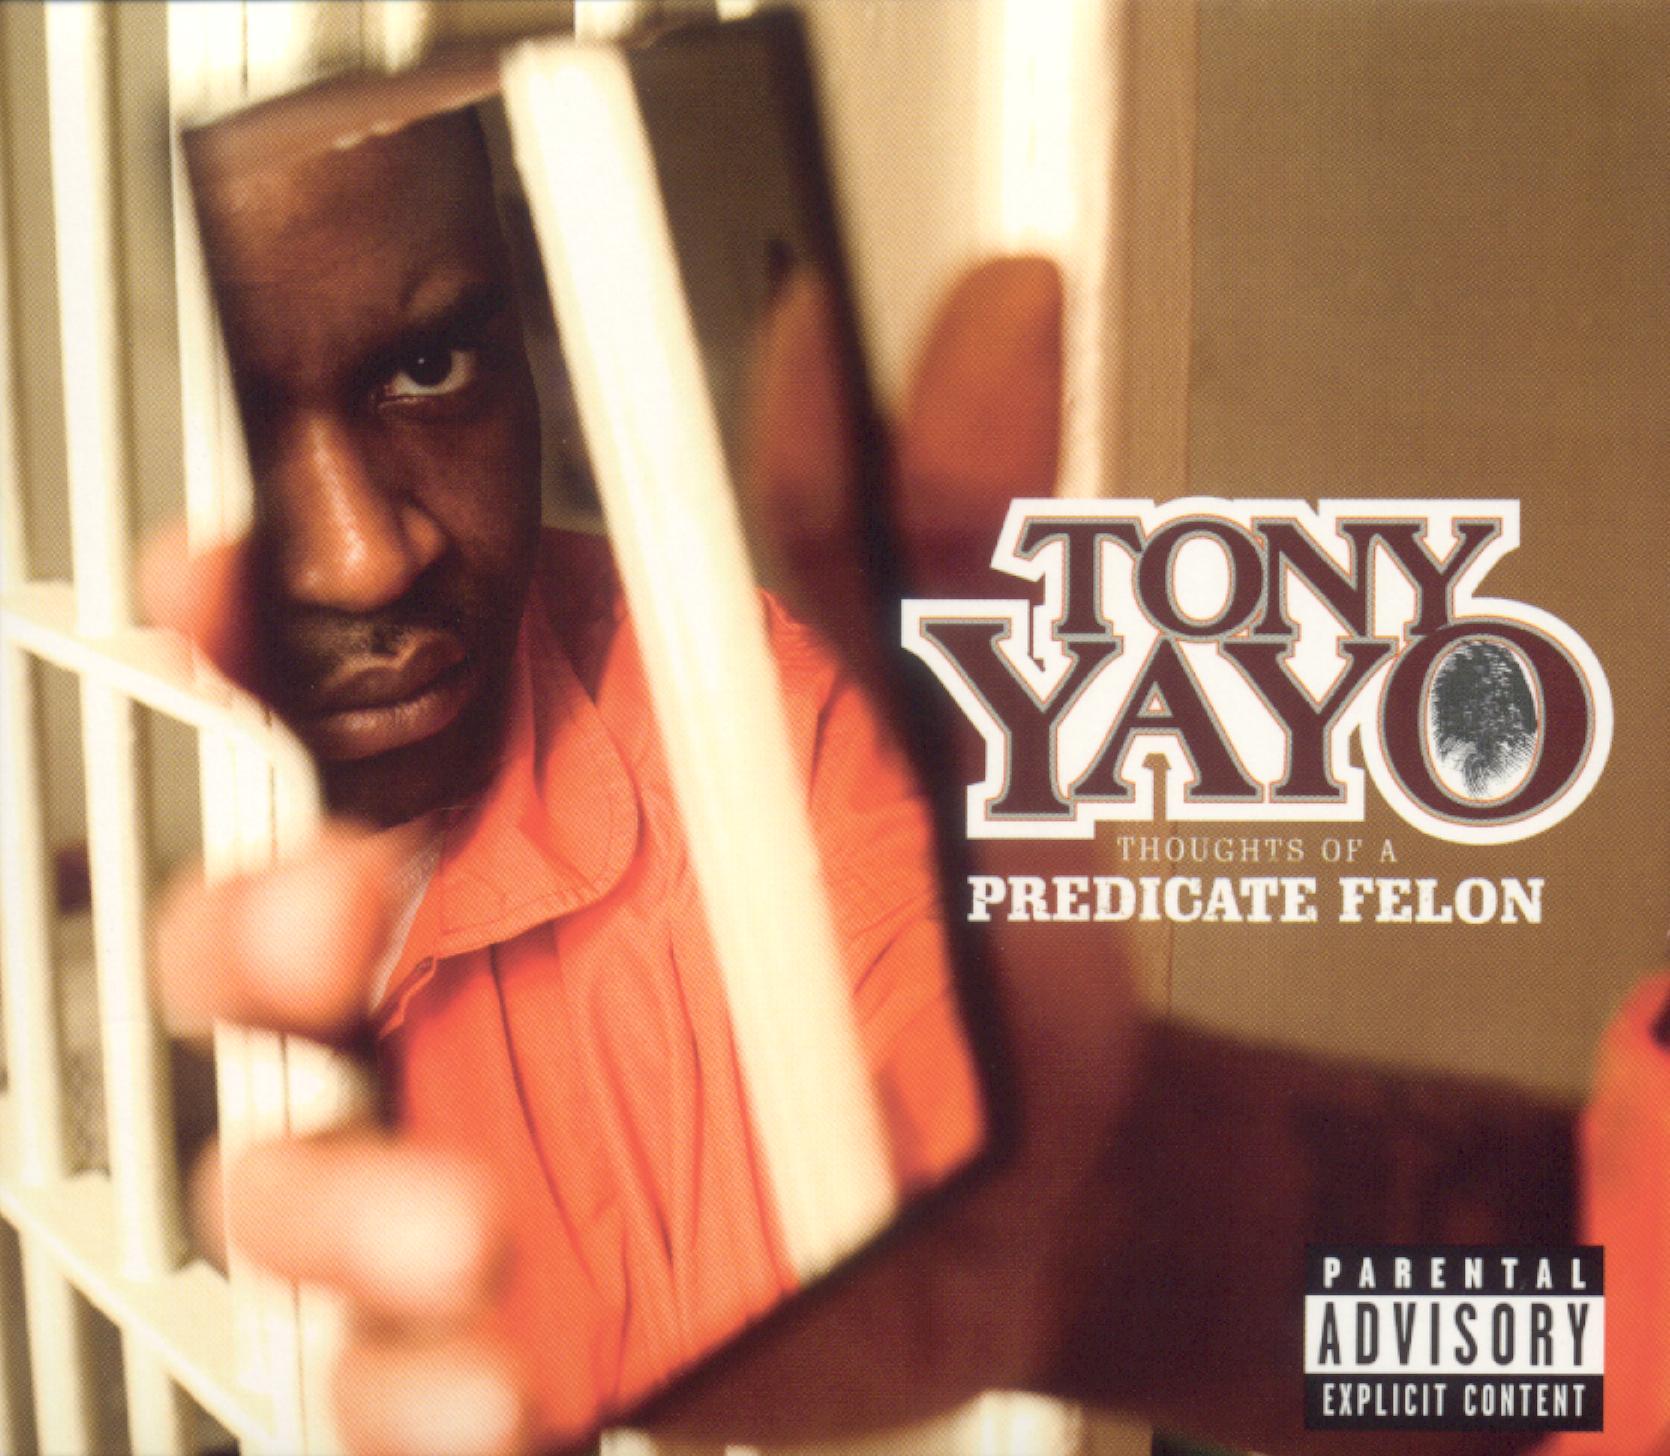 Tony Yayo: Thoughts of a Predicate Felon